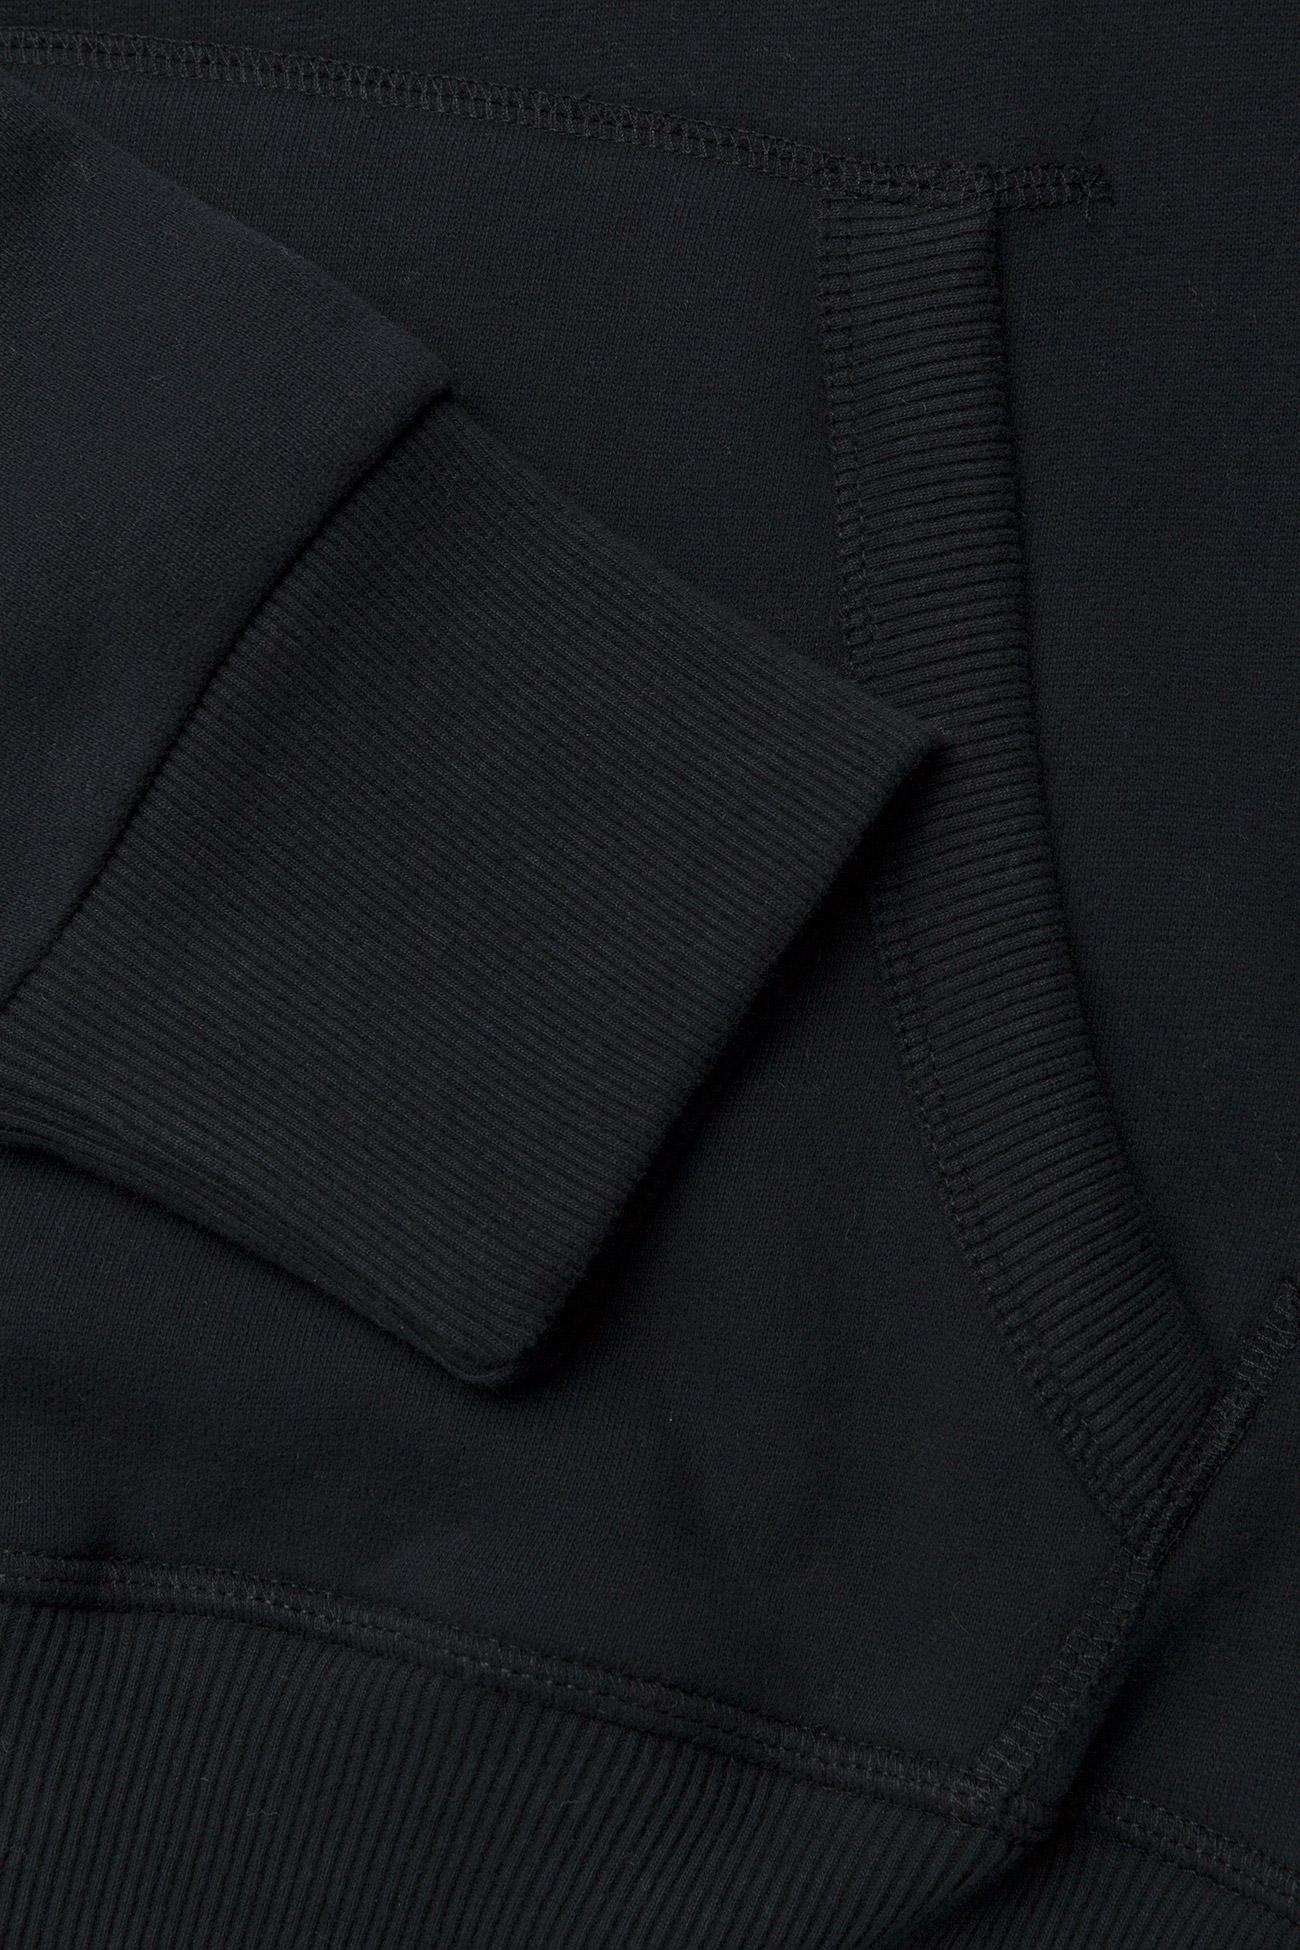 Superdry SWEAT SHIRT SHOP DUO HOOD - Sweatshirts ECLIPSE NAVY - Menn Klær